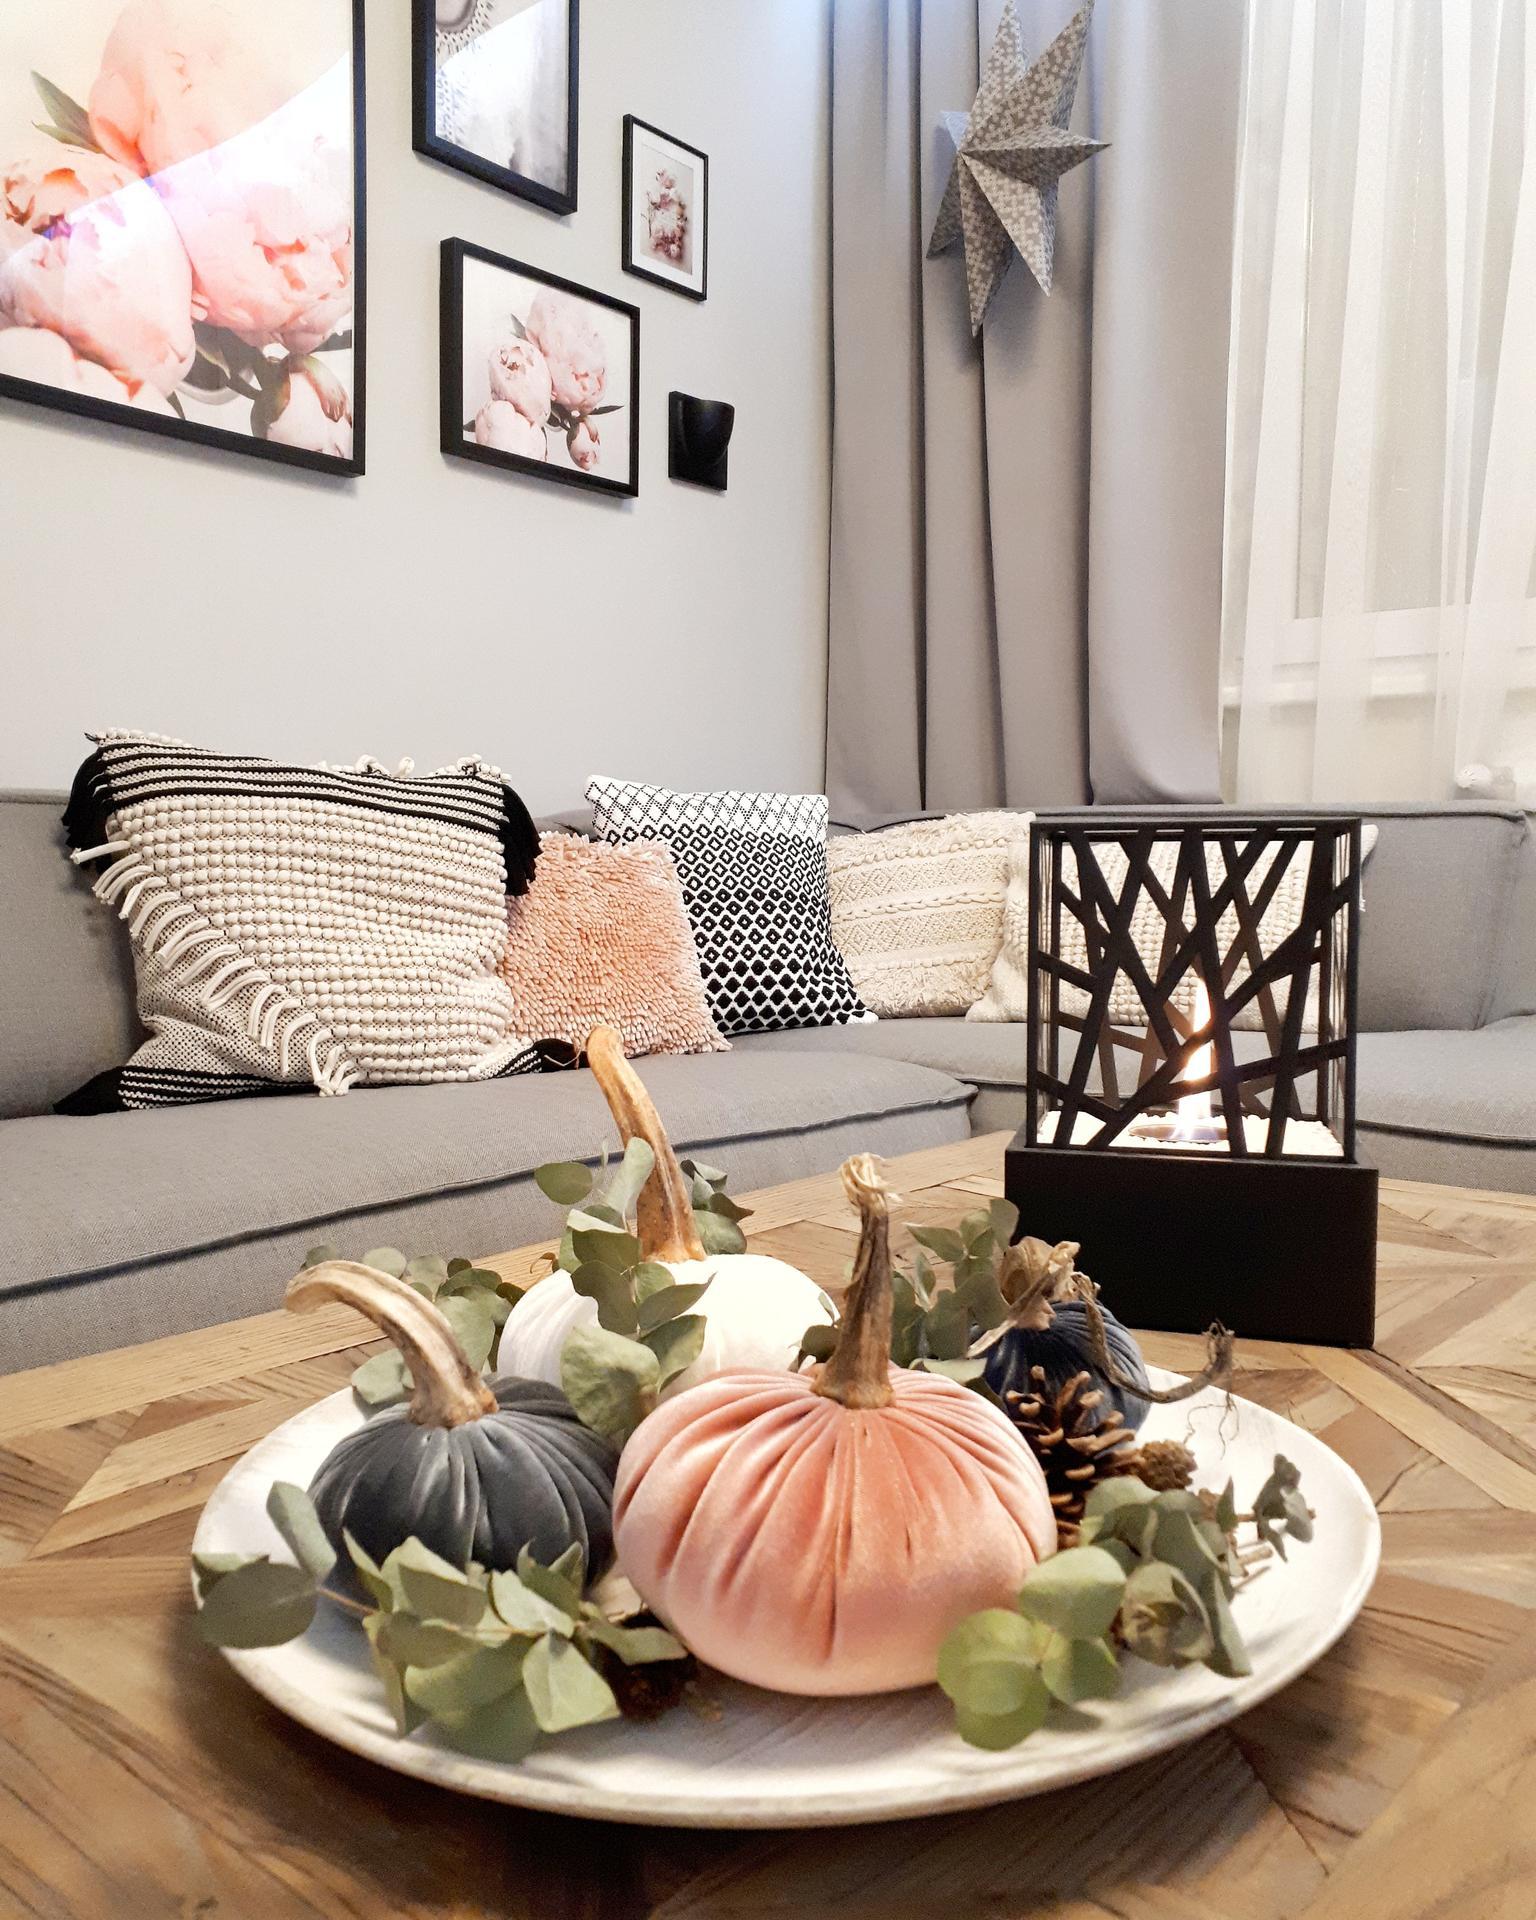 Jeseň u nás doma - Obrázok č. 41